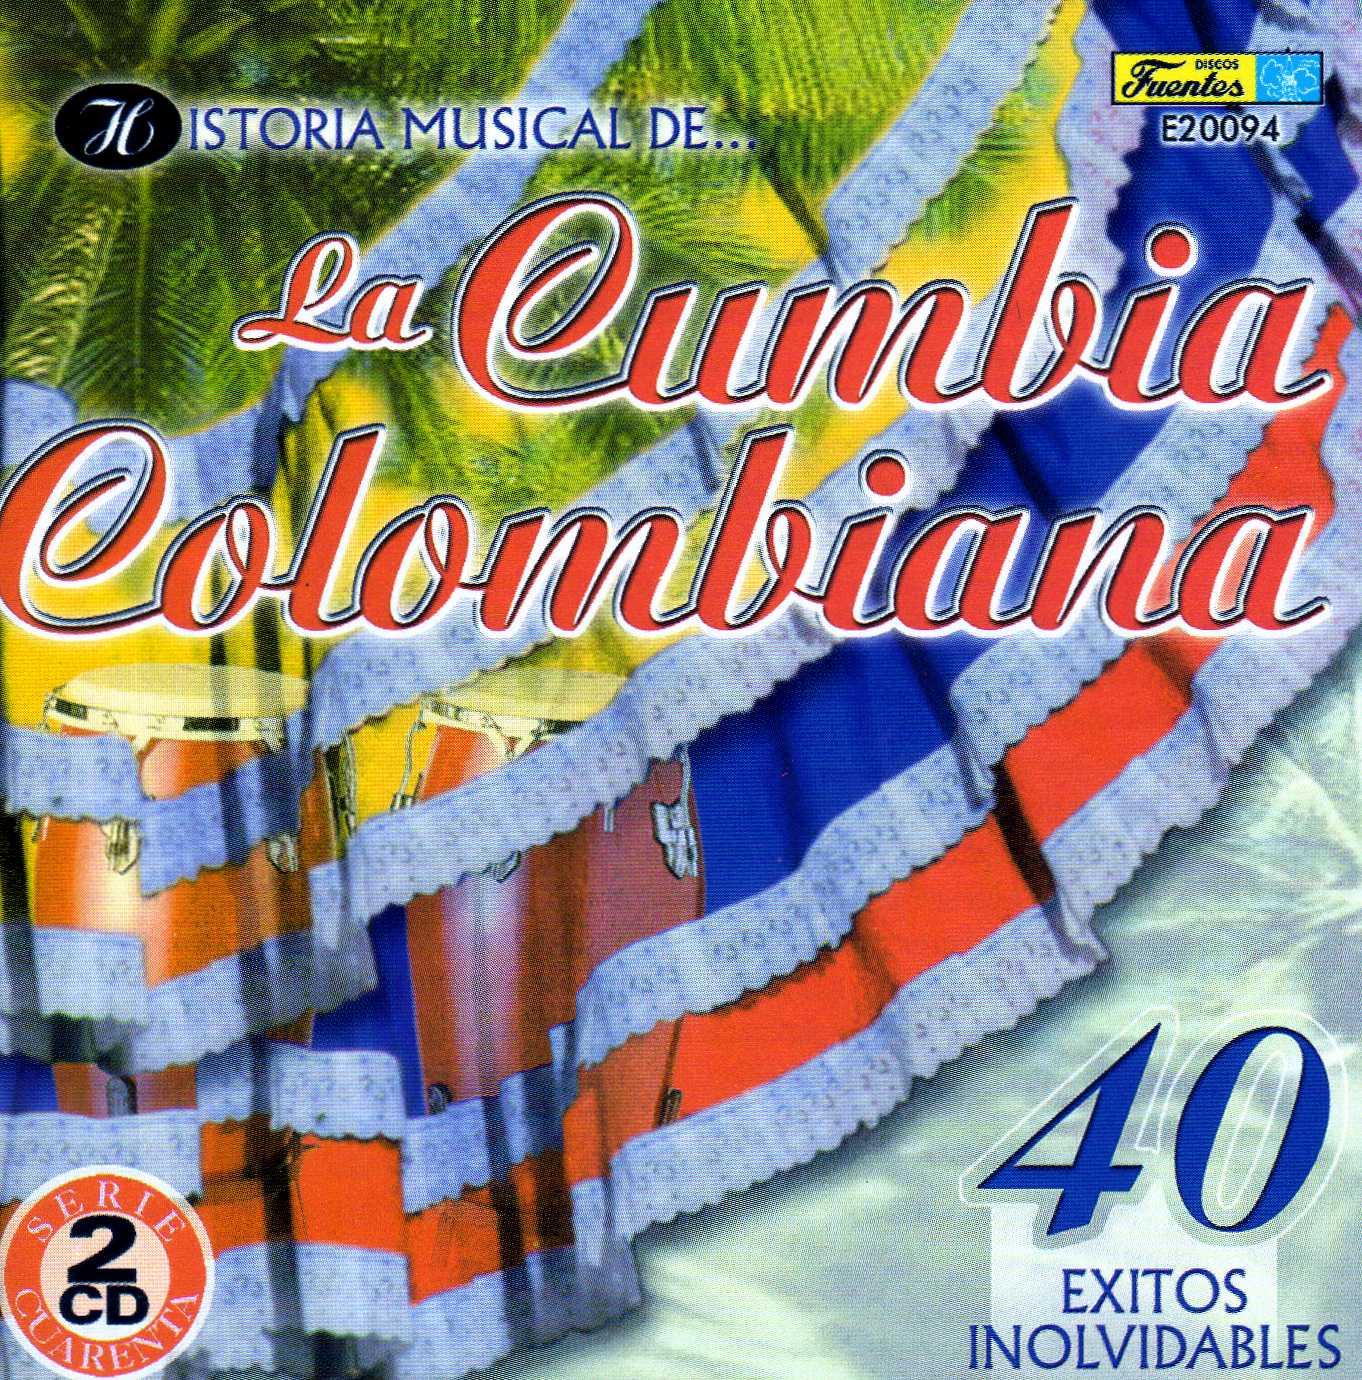 musica cumbia colombiana: